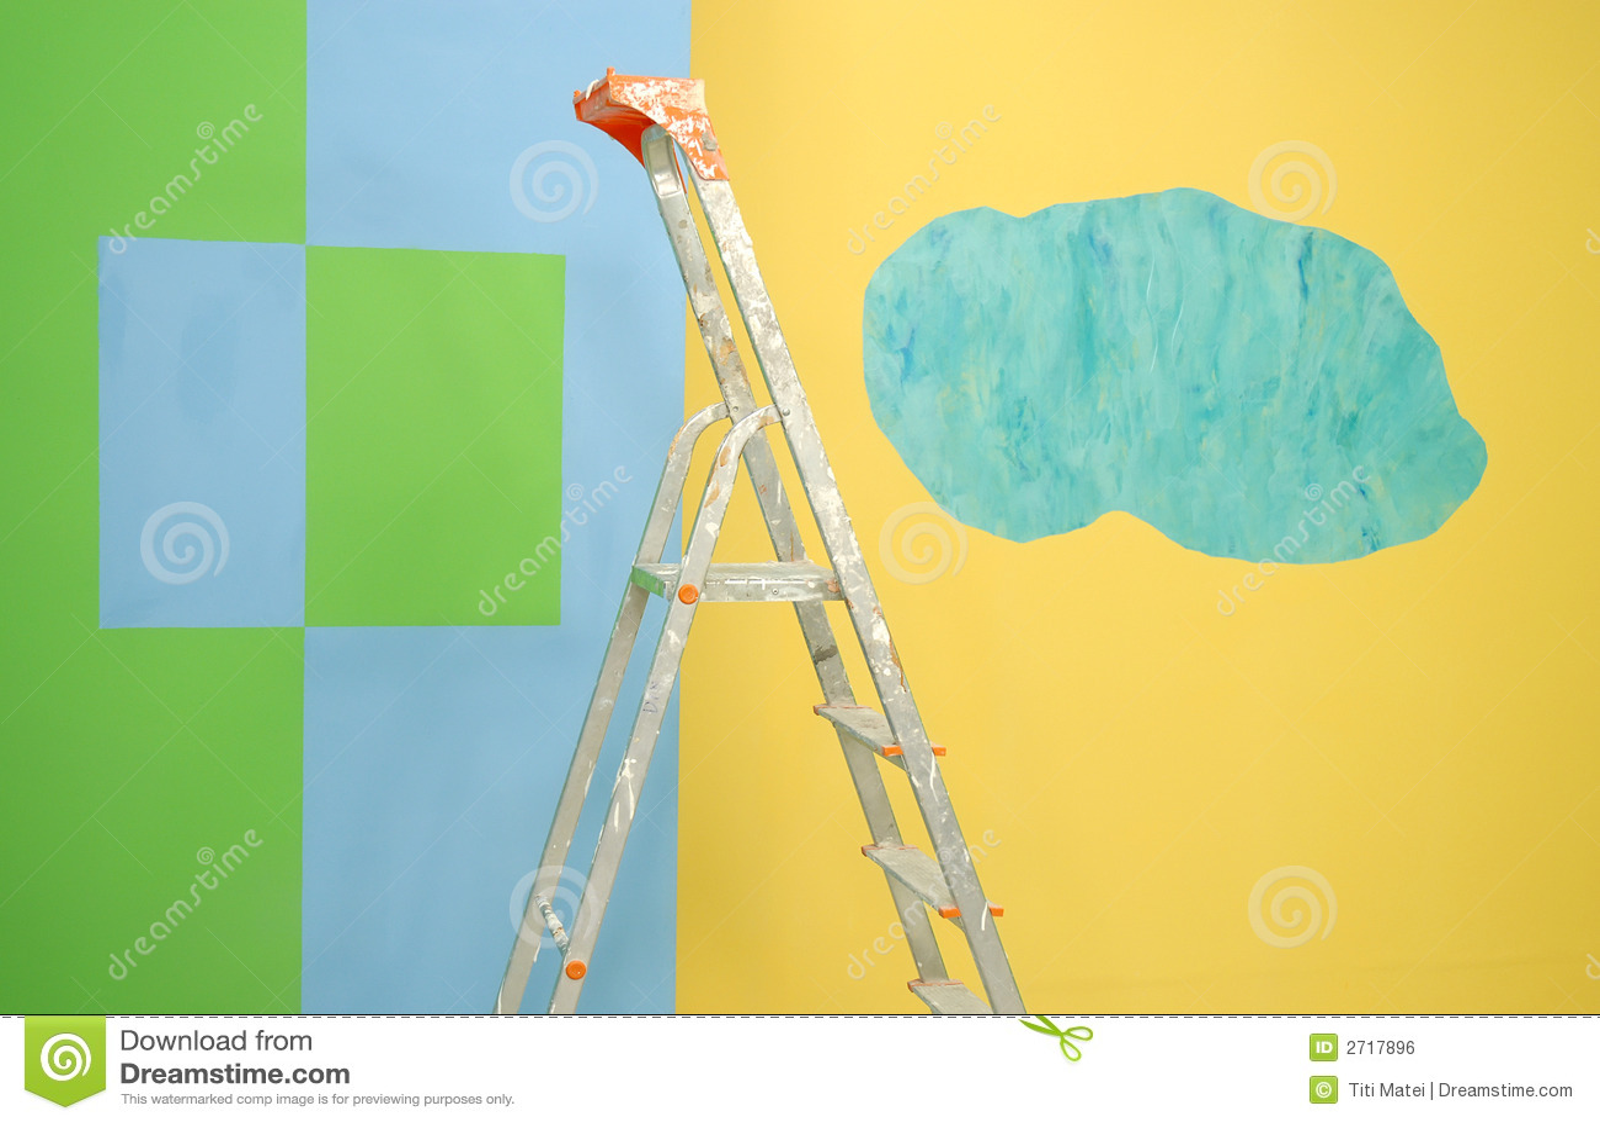 Escada por paredes pintadas imagem de stock royalty free - Paredes pintadas ...